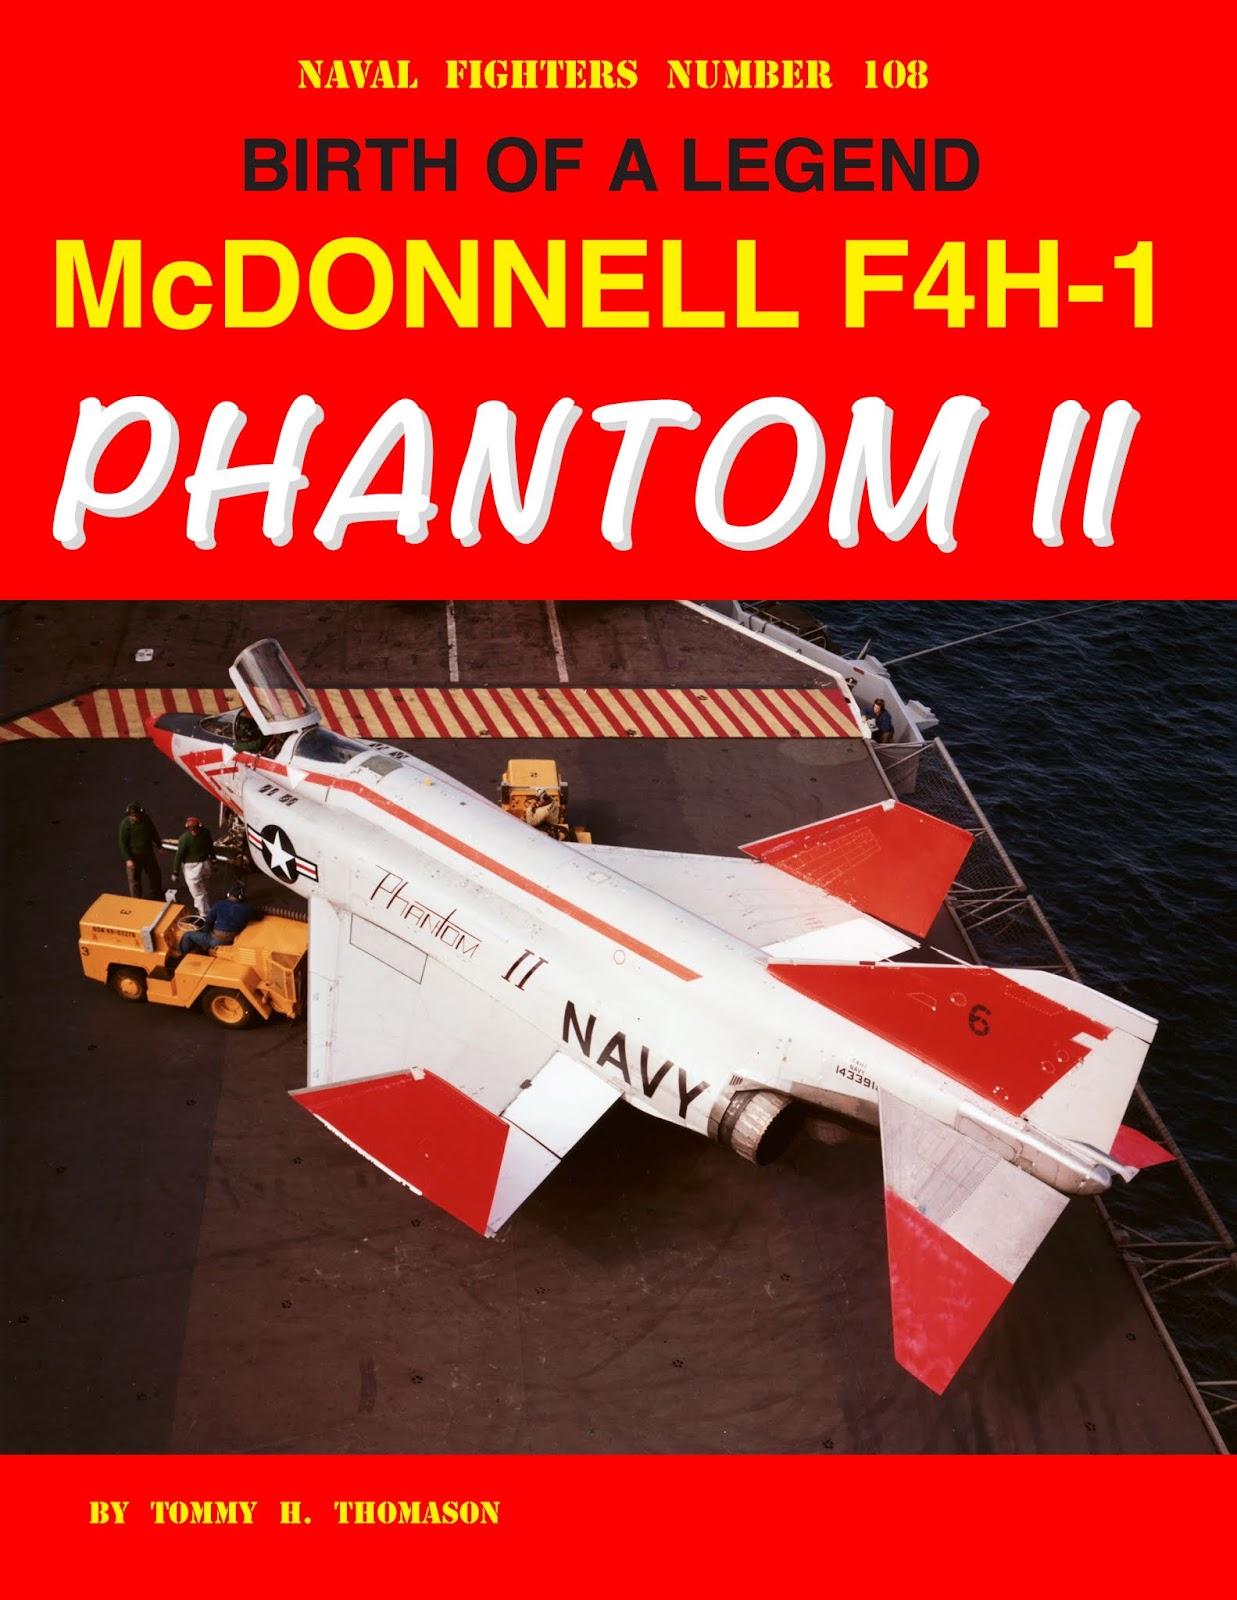 U S  Navy Aircraft History: 2018